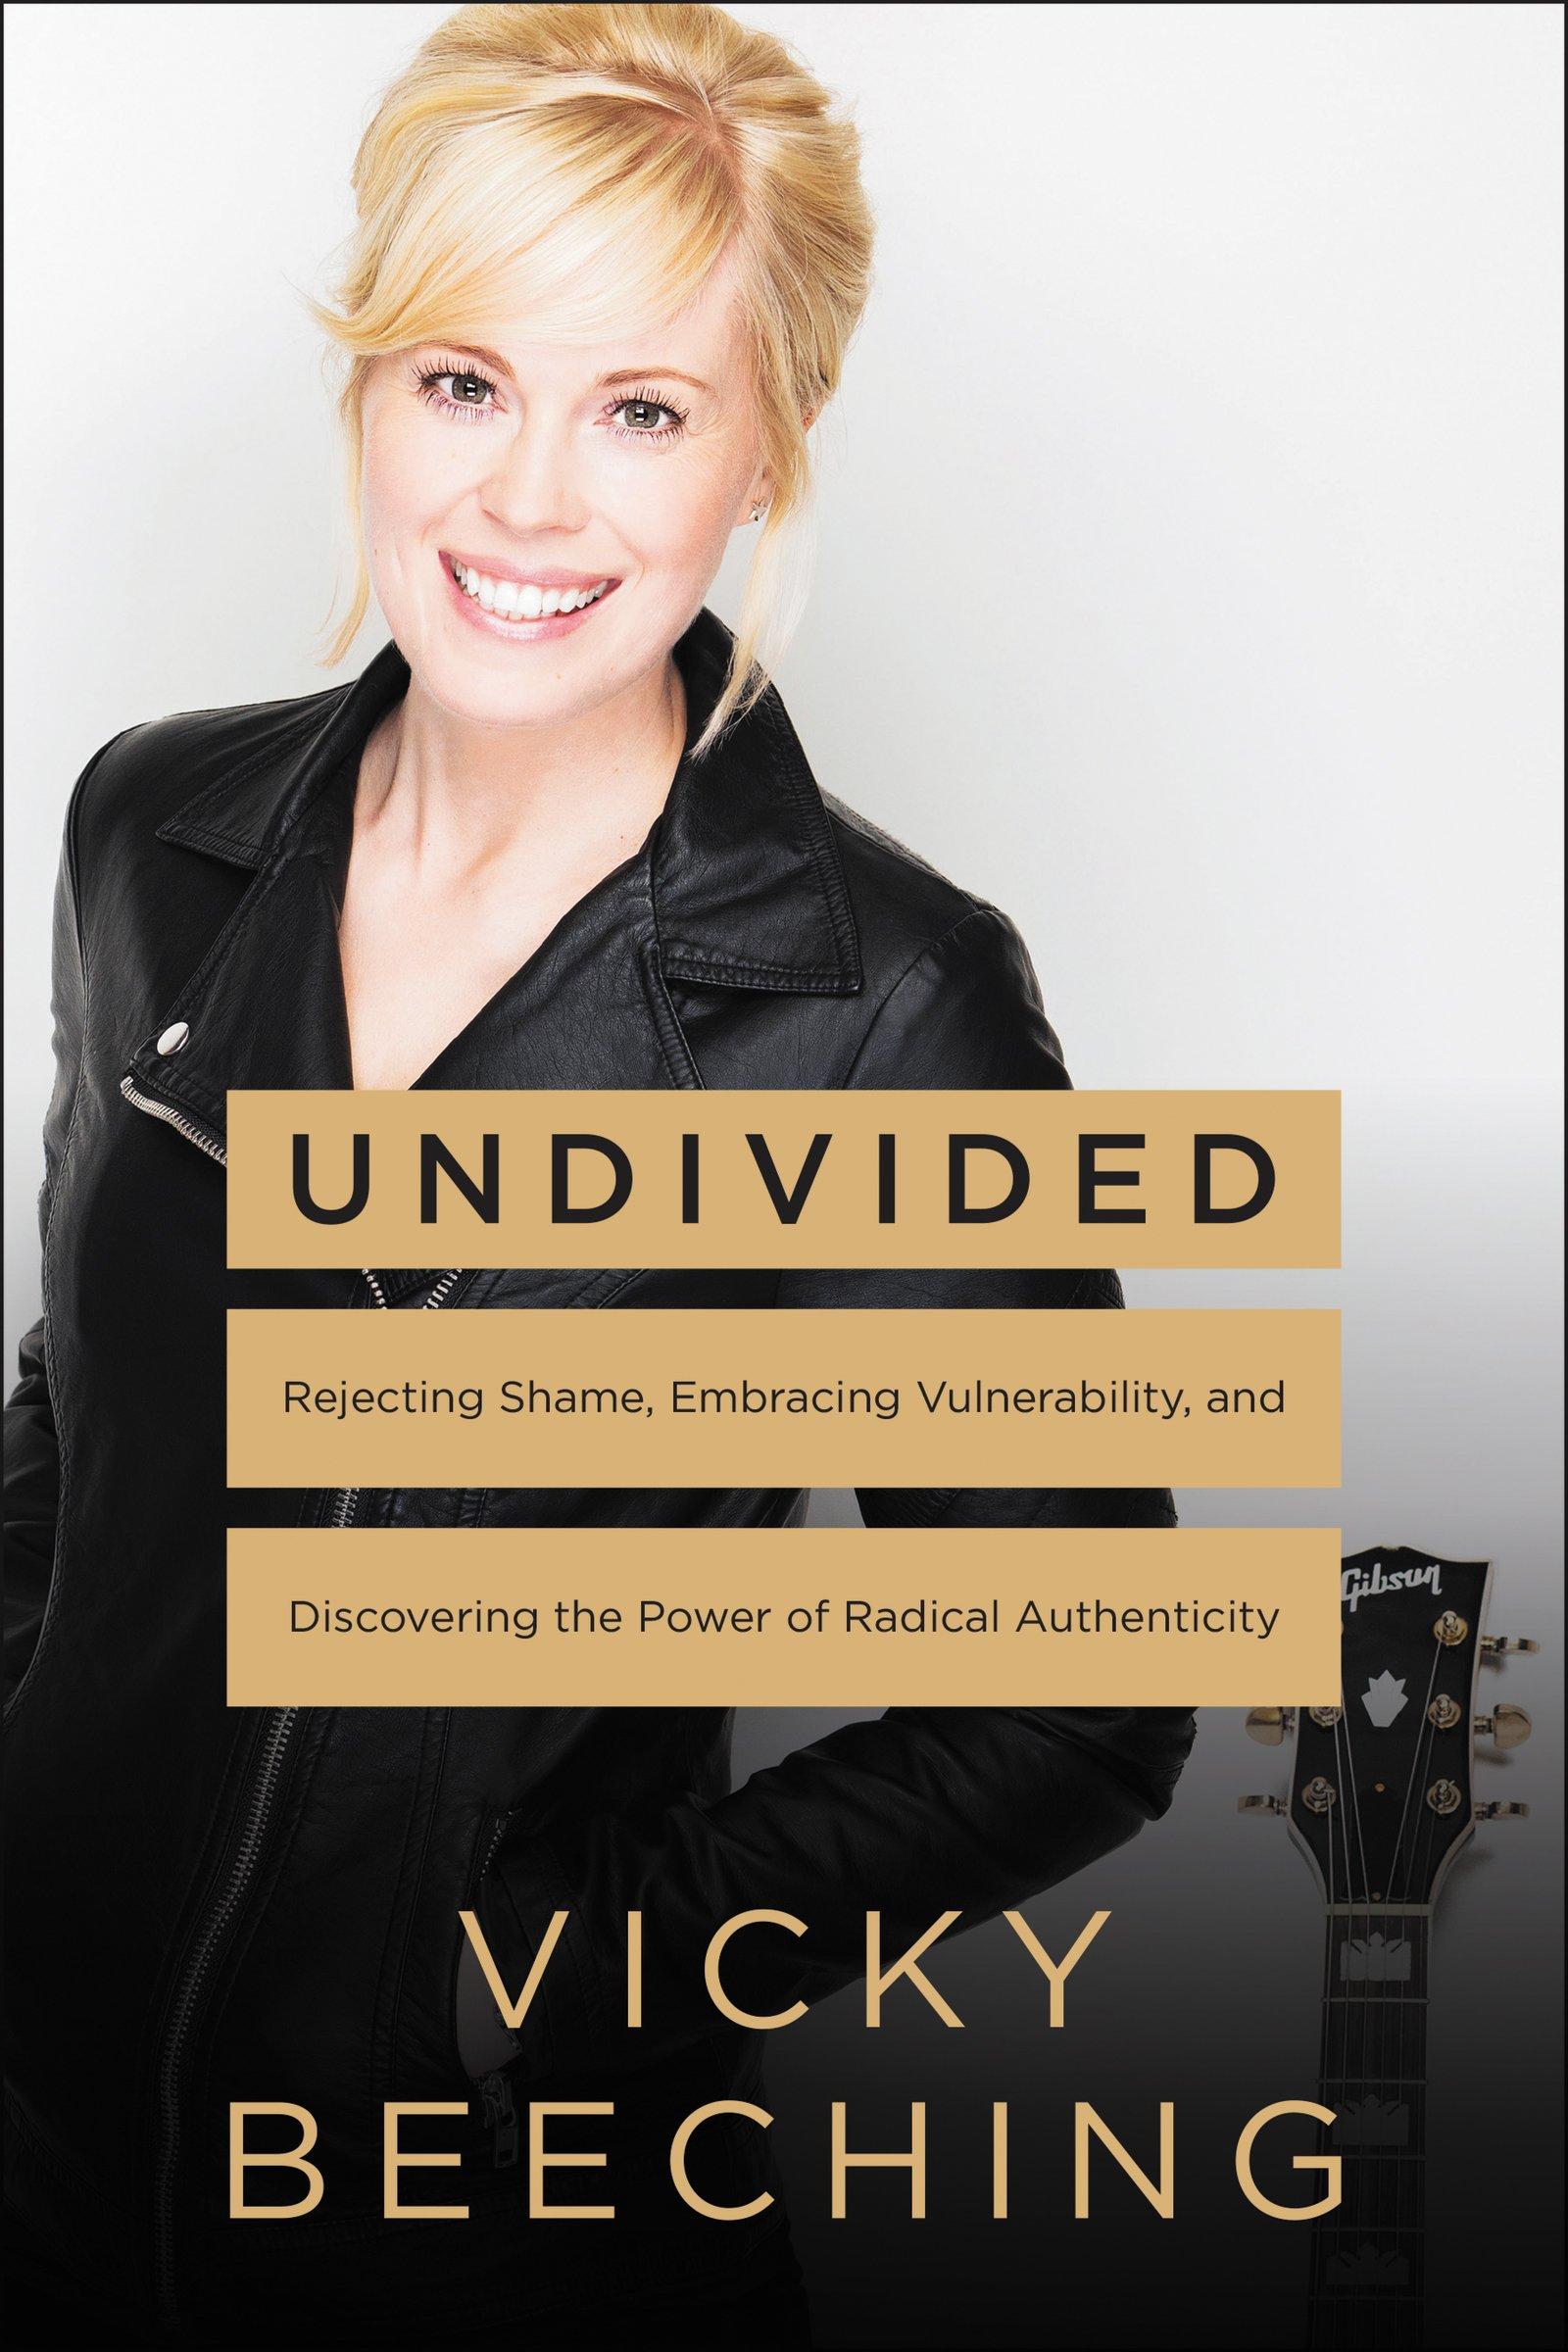 18th June 2018 – Vicky Beeching's Undivided